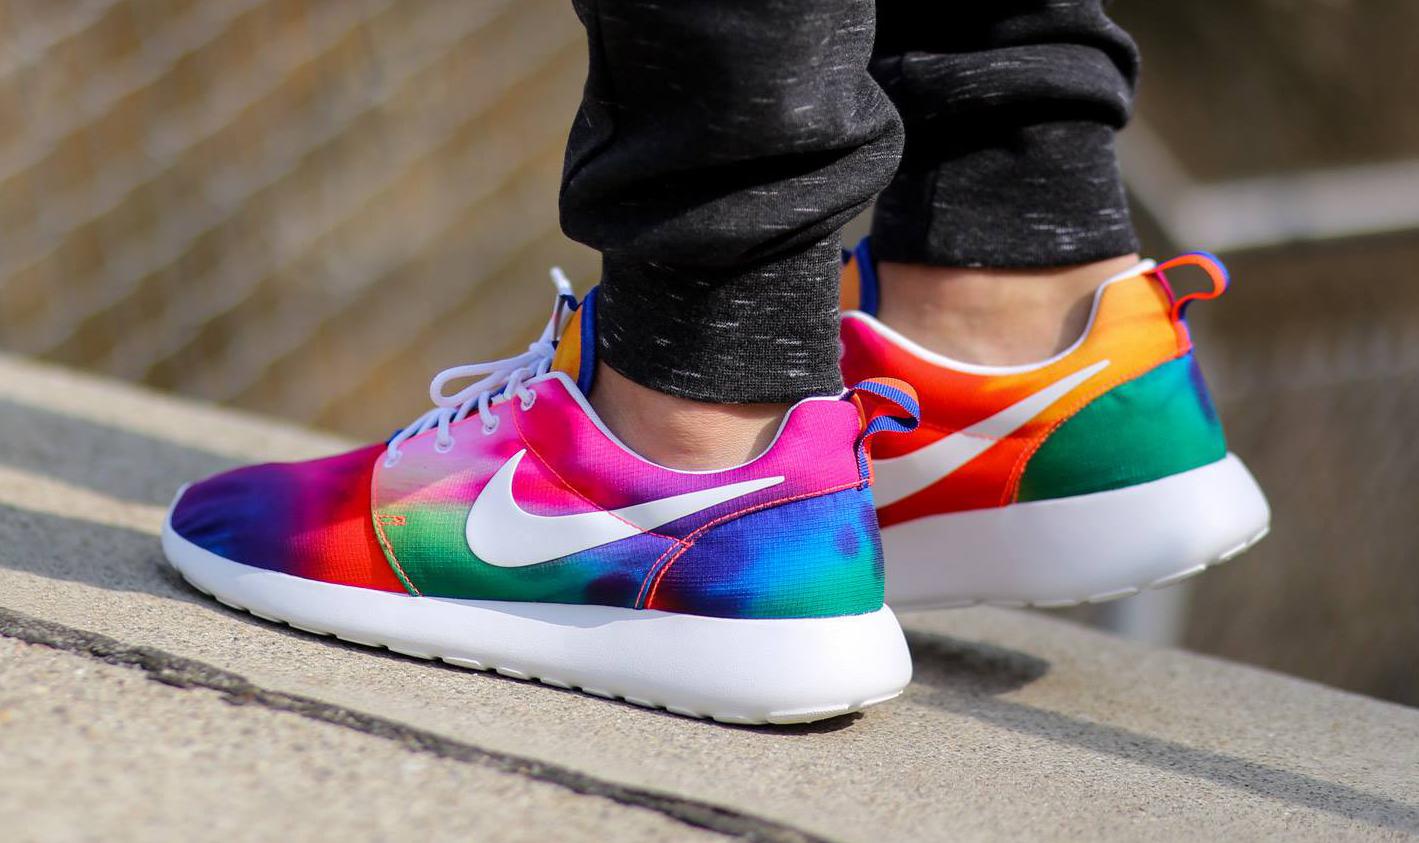 Nike Gets Groovy with Tie Dye Roshe Runs